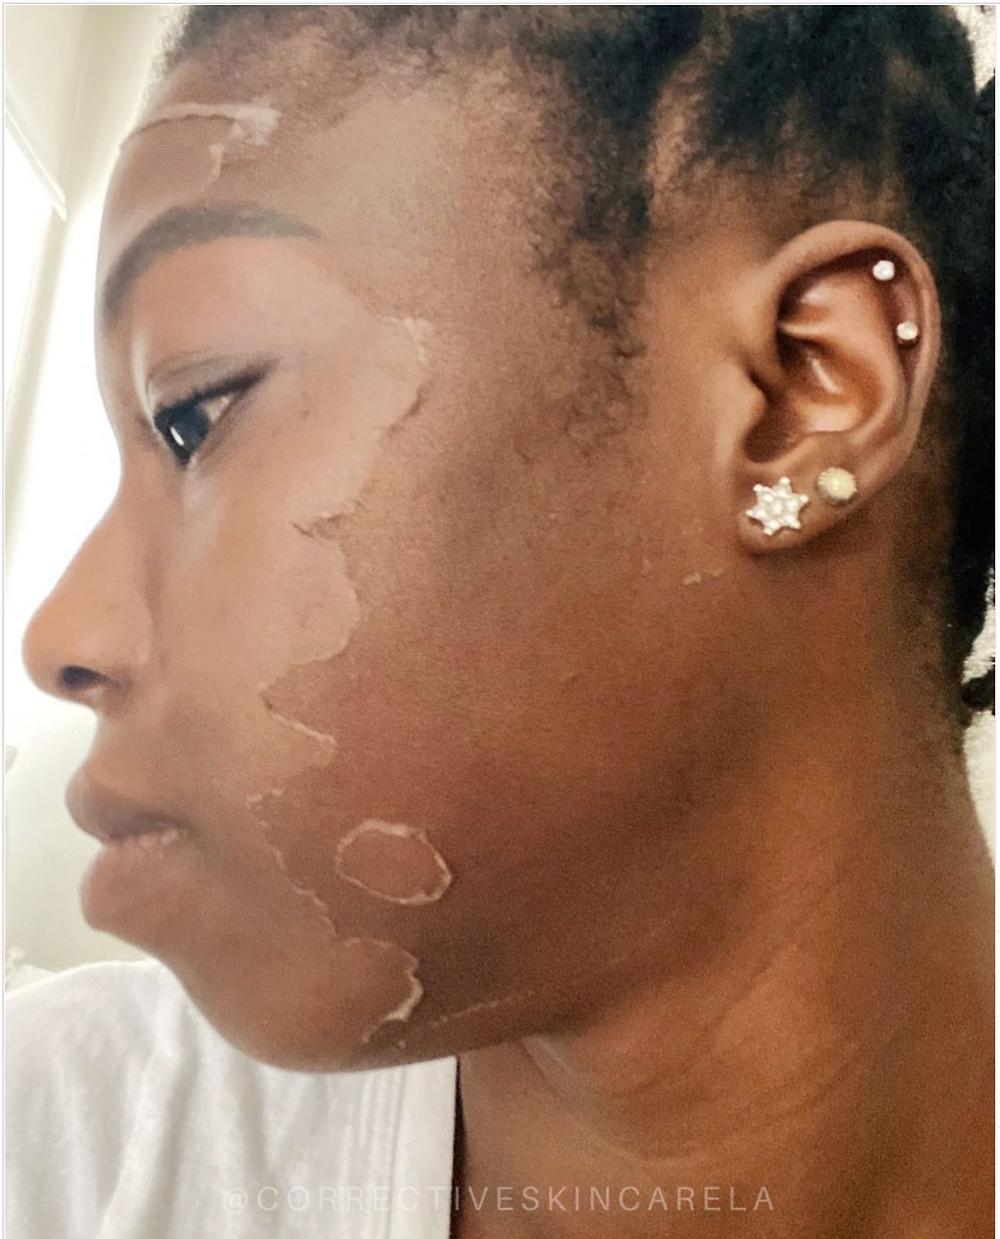 Corrective-Skincare-LA-Custom-ProPeel-Chemical-Peeling-Results